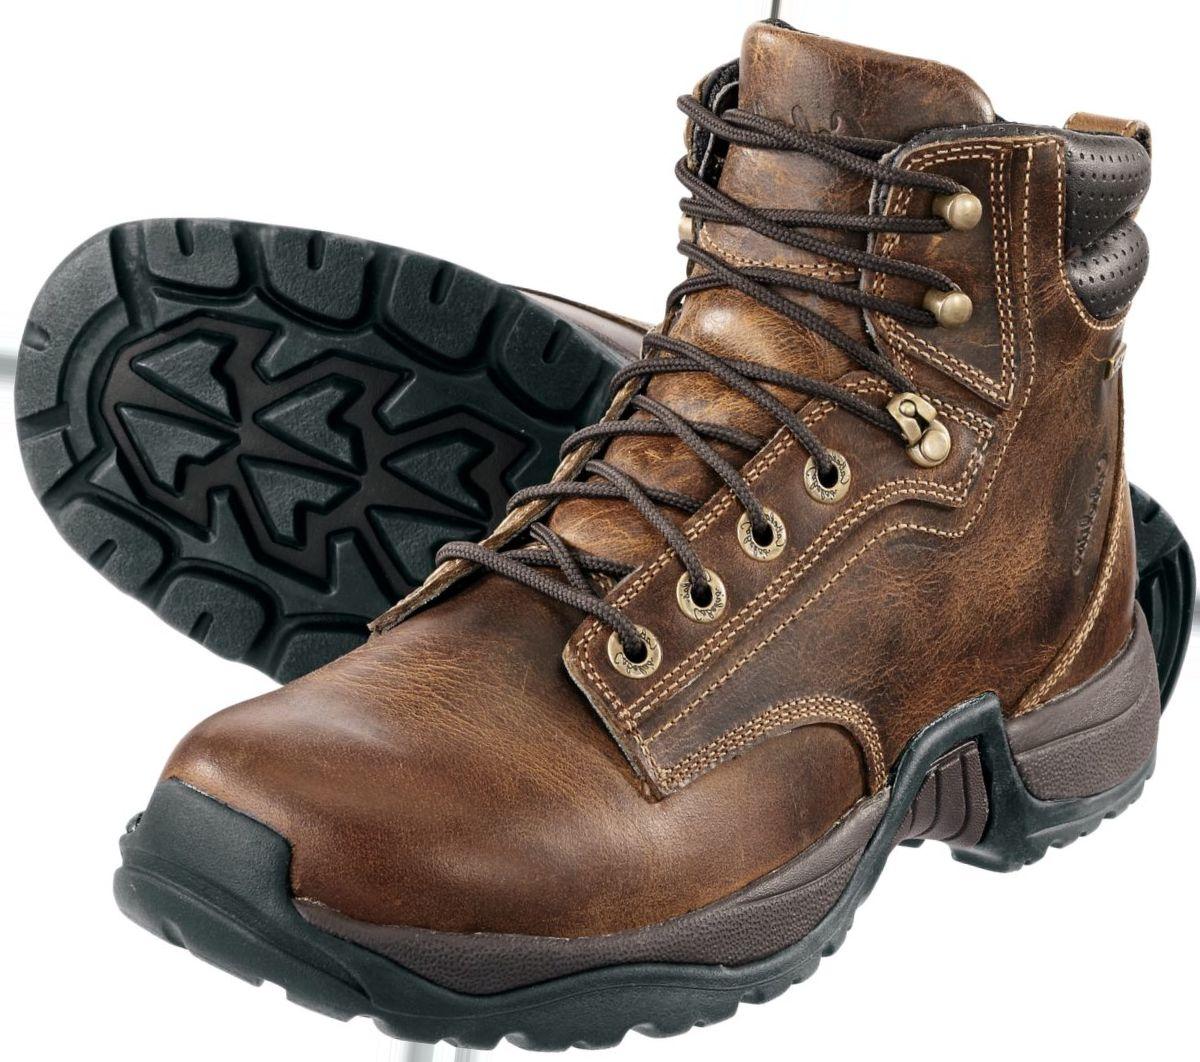 "Cabela's Roughneck™ 6"" NMT Ledger Work Boots"